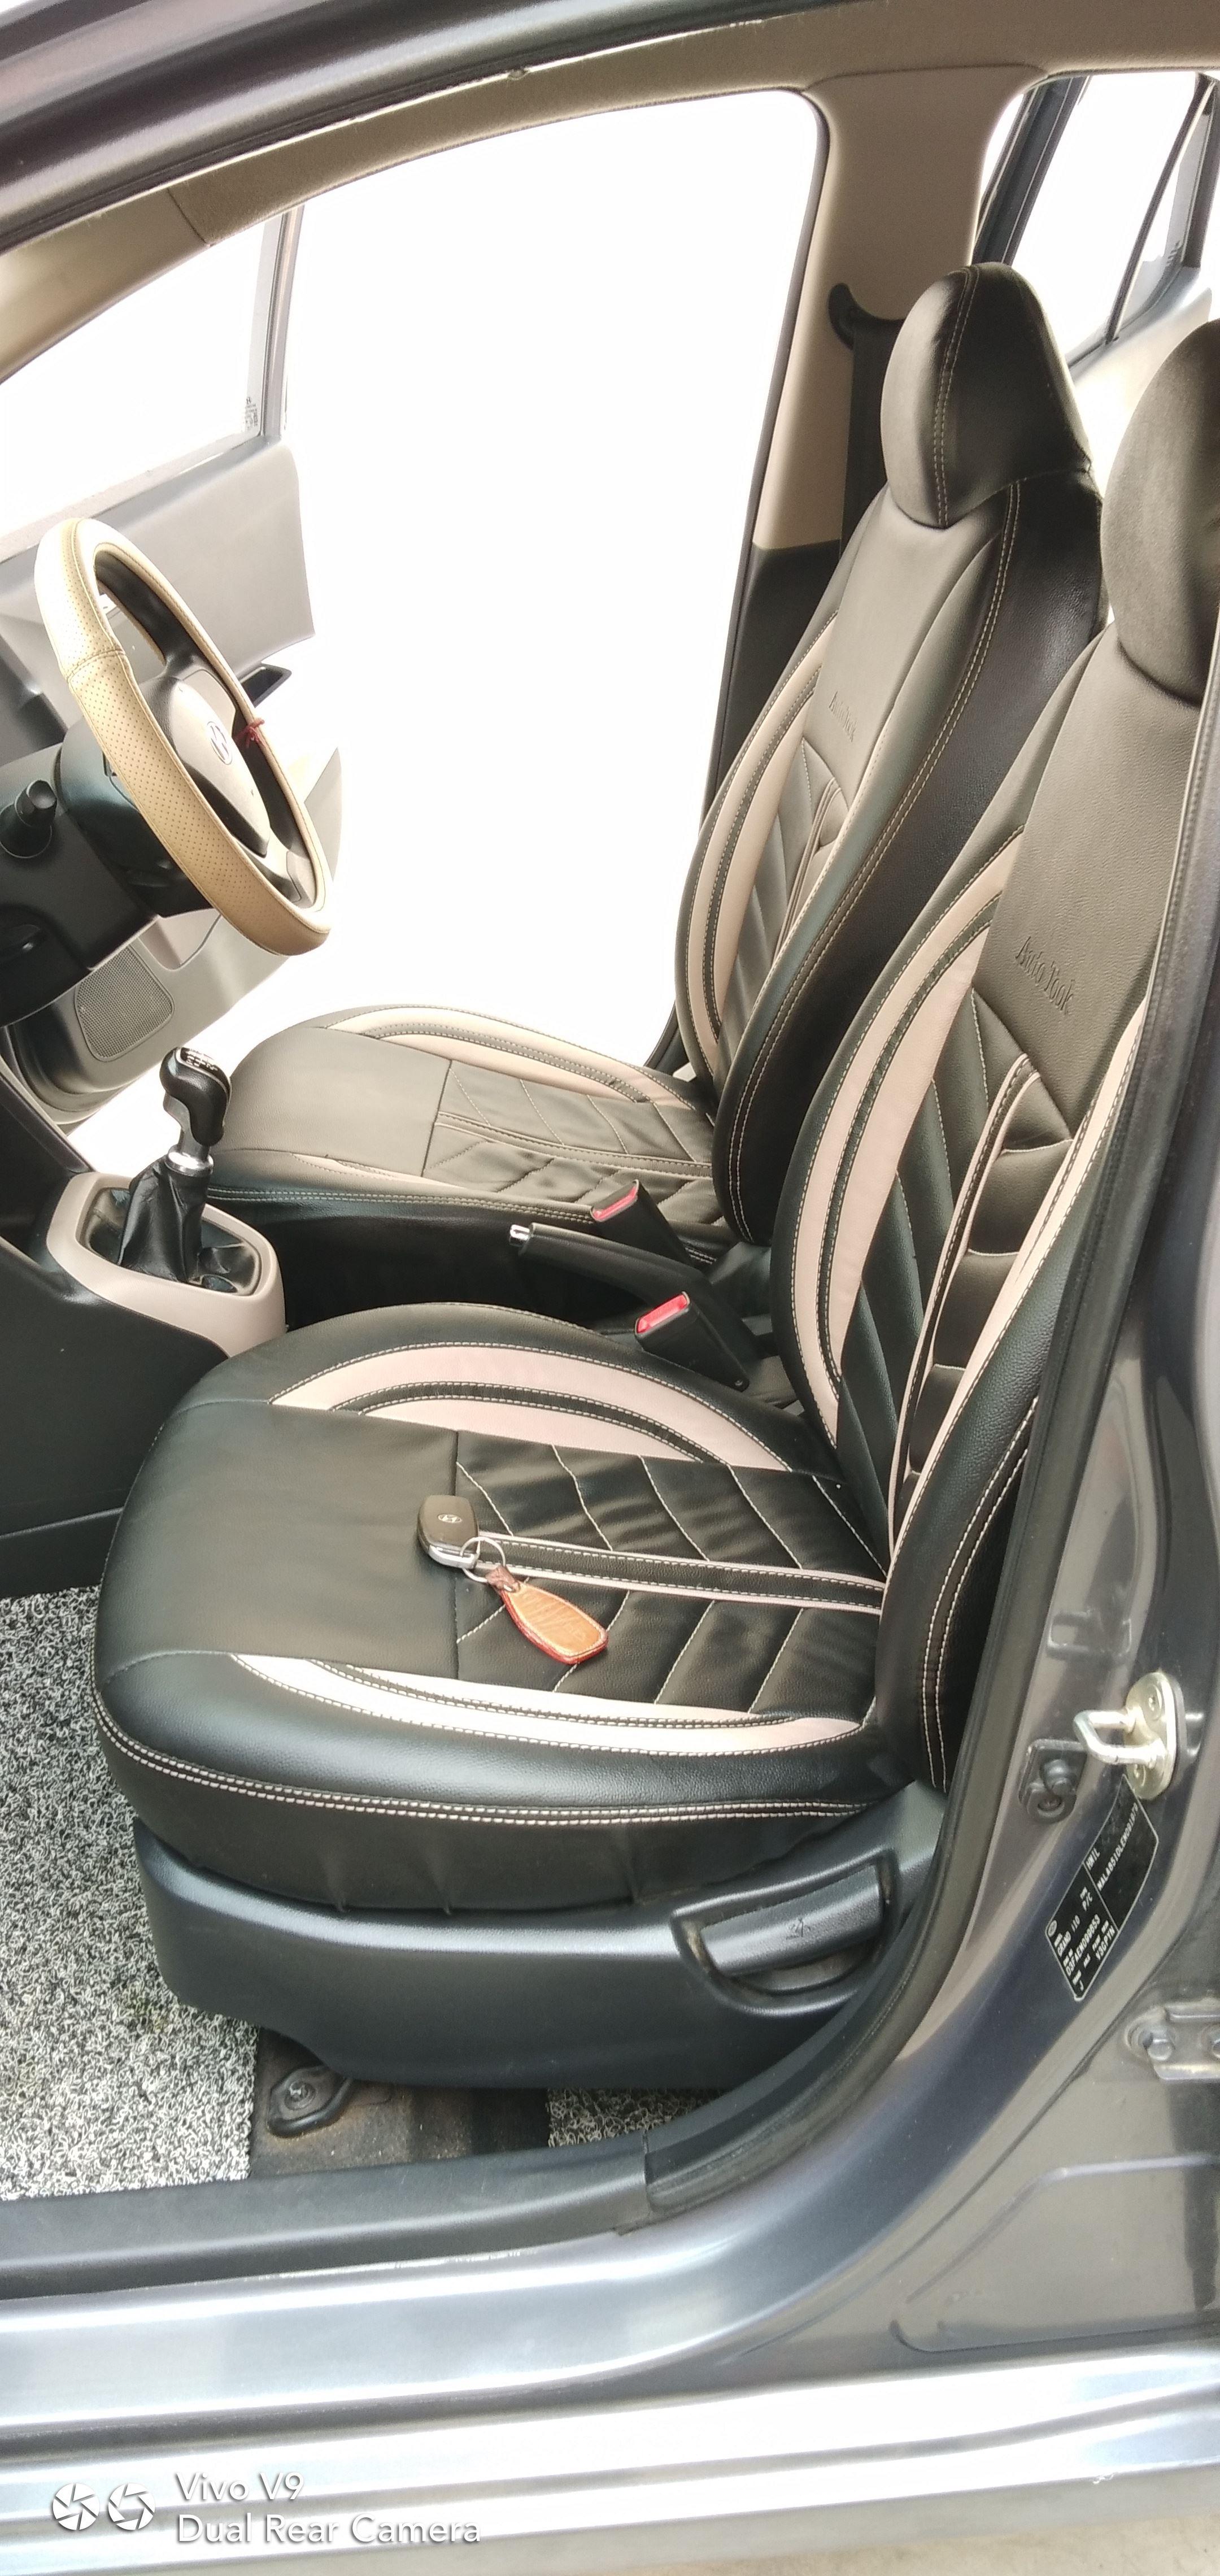 2014 Used Hyundai Grand I10 SPORTZ U2 1.2 CRDI